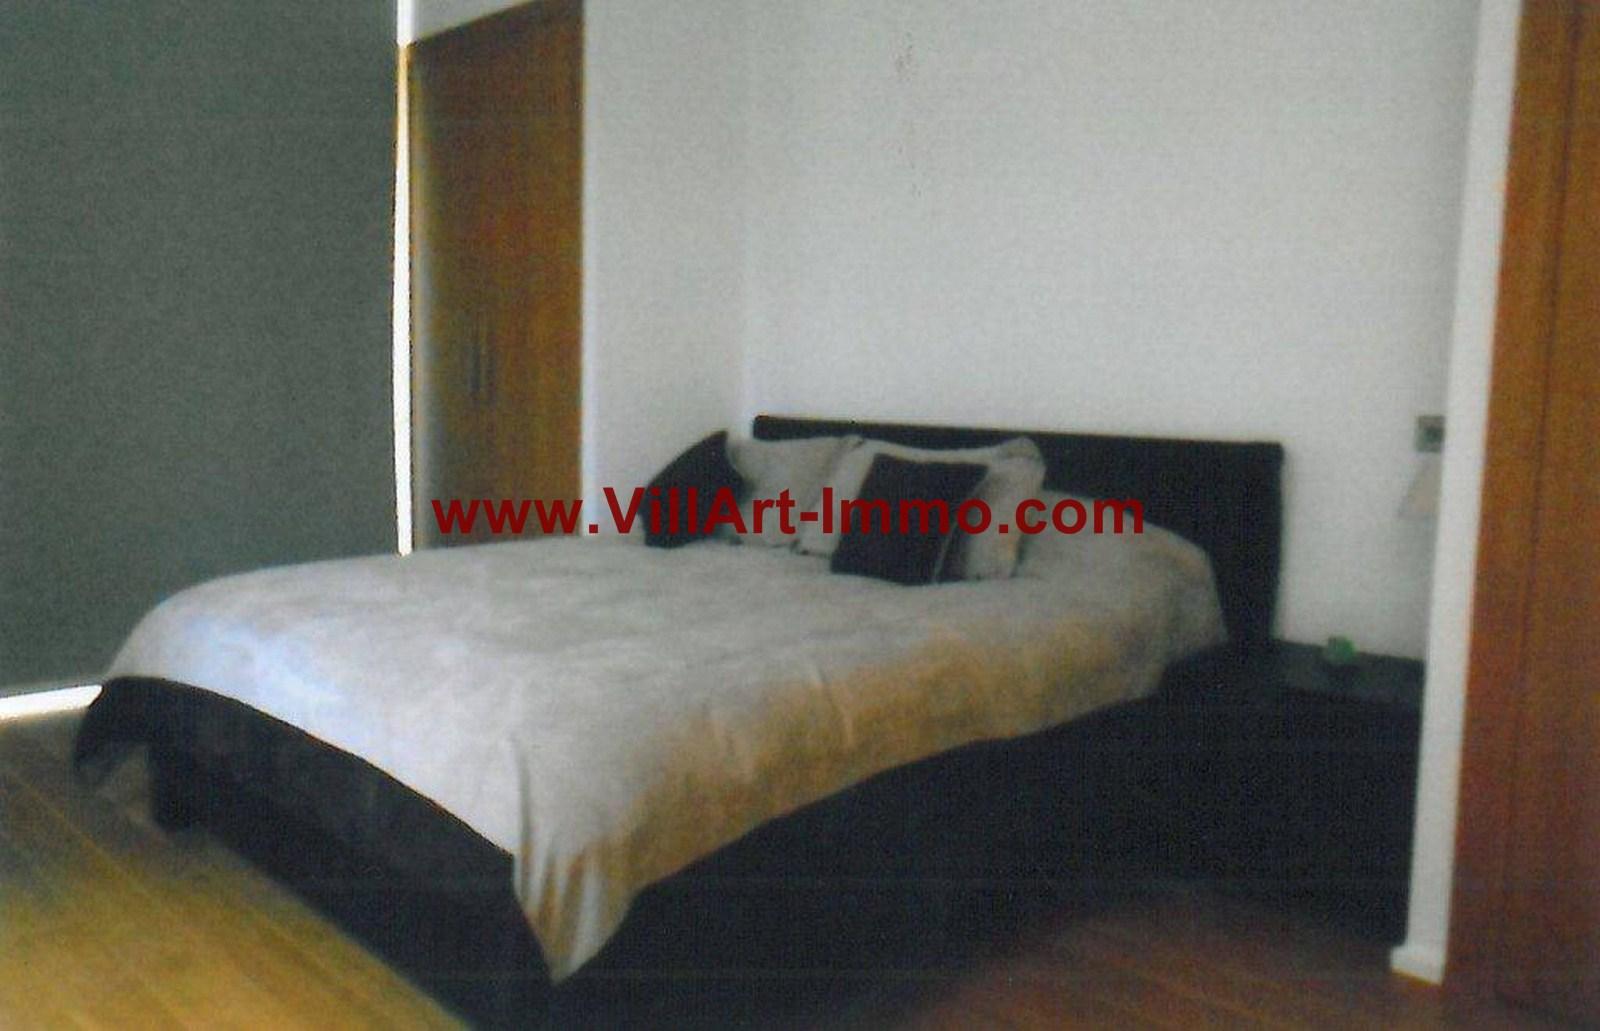 7-Location-Appartement-Meublé-Tanger-Chambre 2-L749-Villart immo